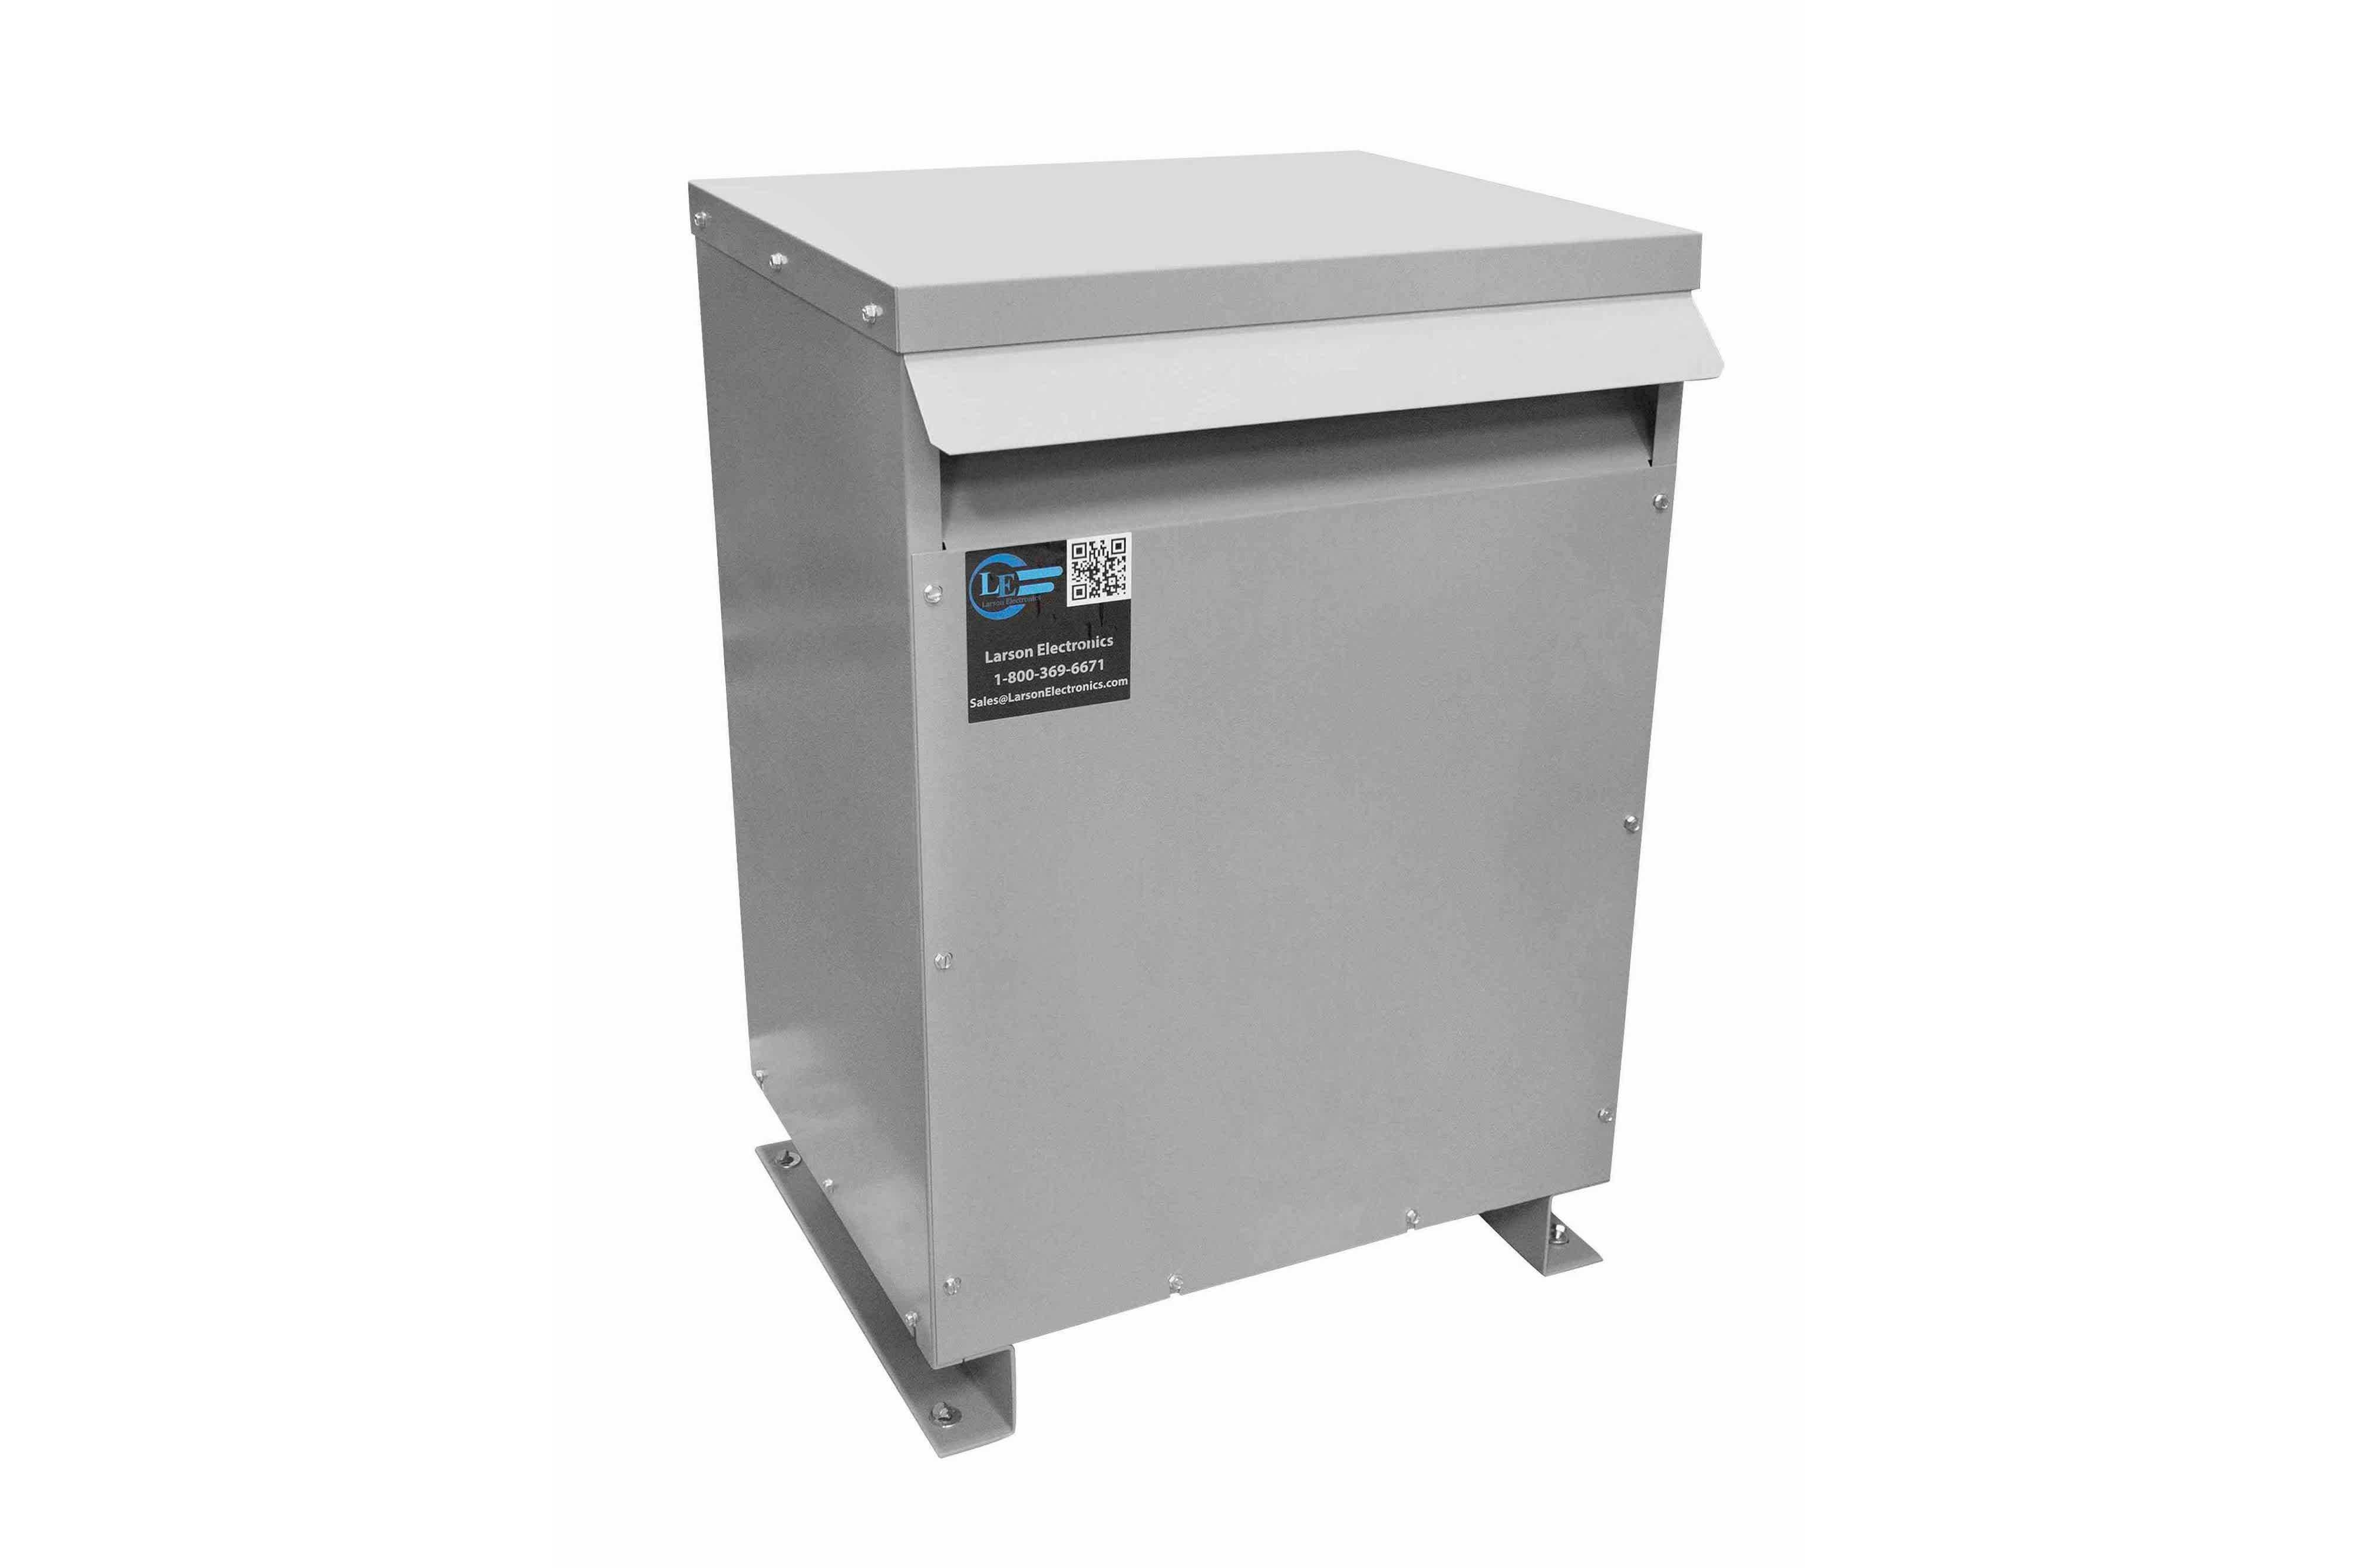 500 kVA 3PH Isolation Transformer, 400V Wye Primary, 480V Delta Secondary, N3R, Ventilated, 60 Hz